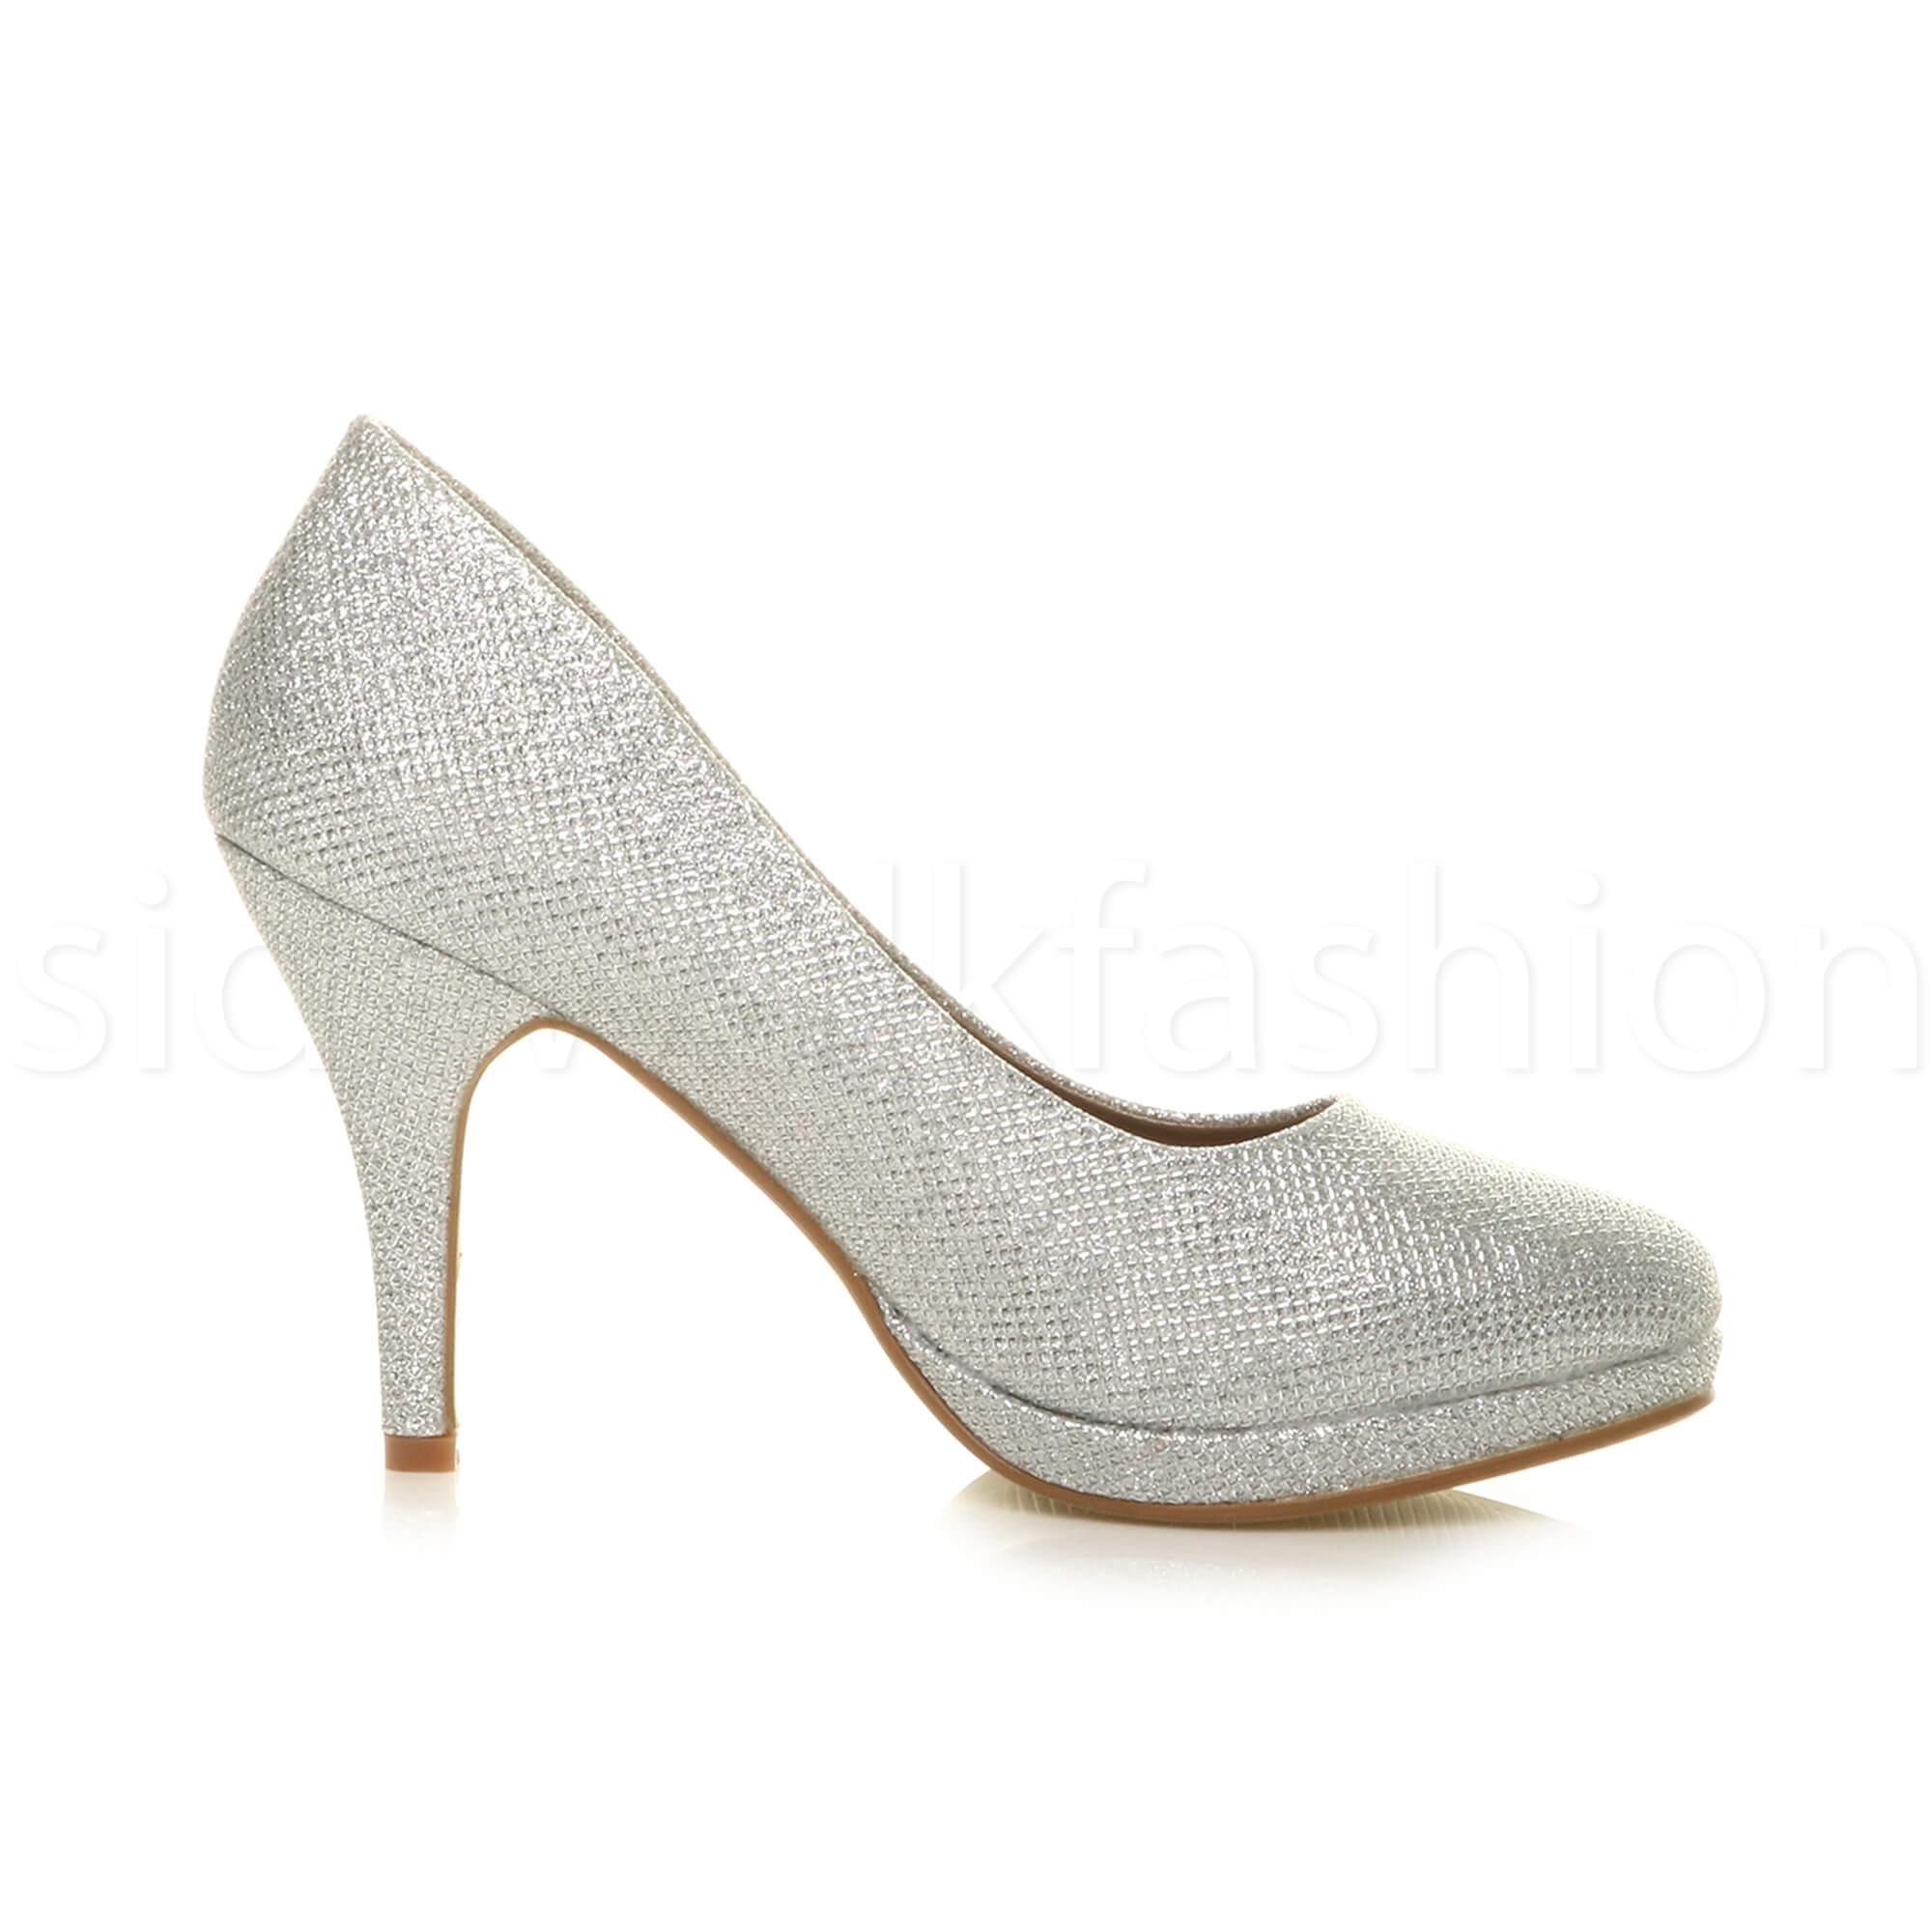 Womens-ladies-high-mid-heel-platform-wedding-evening-bridesmaid-court-shoes-size thumbnail 172